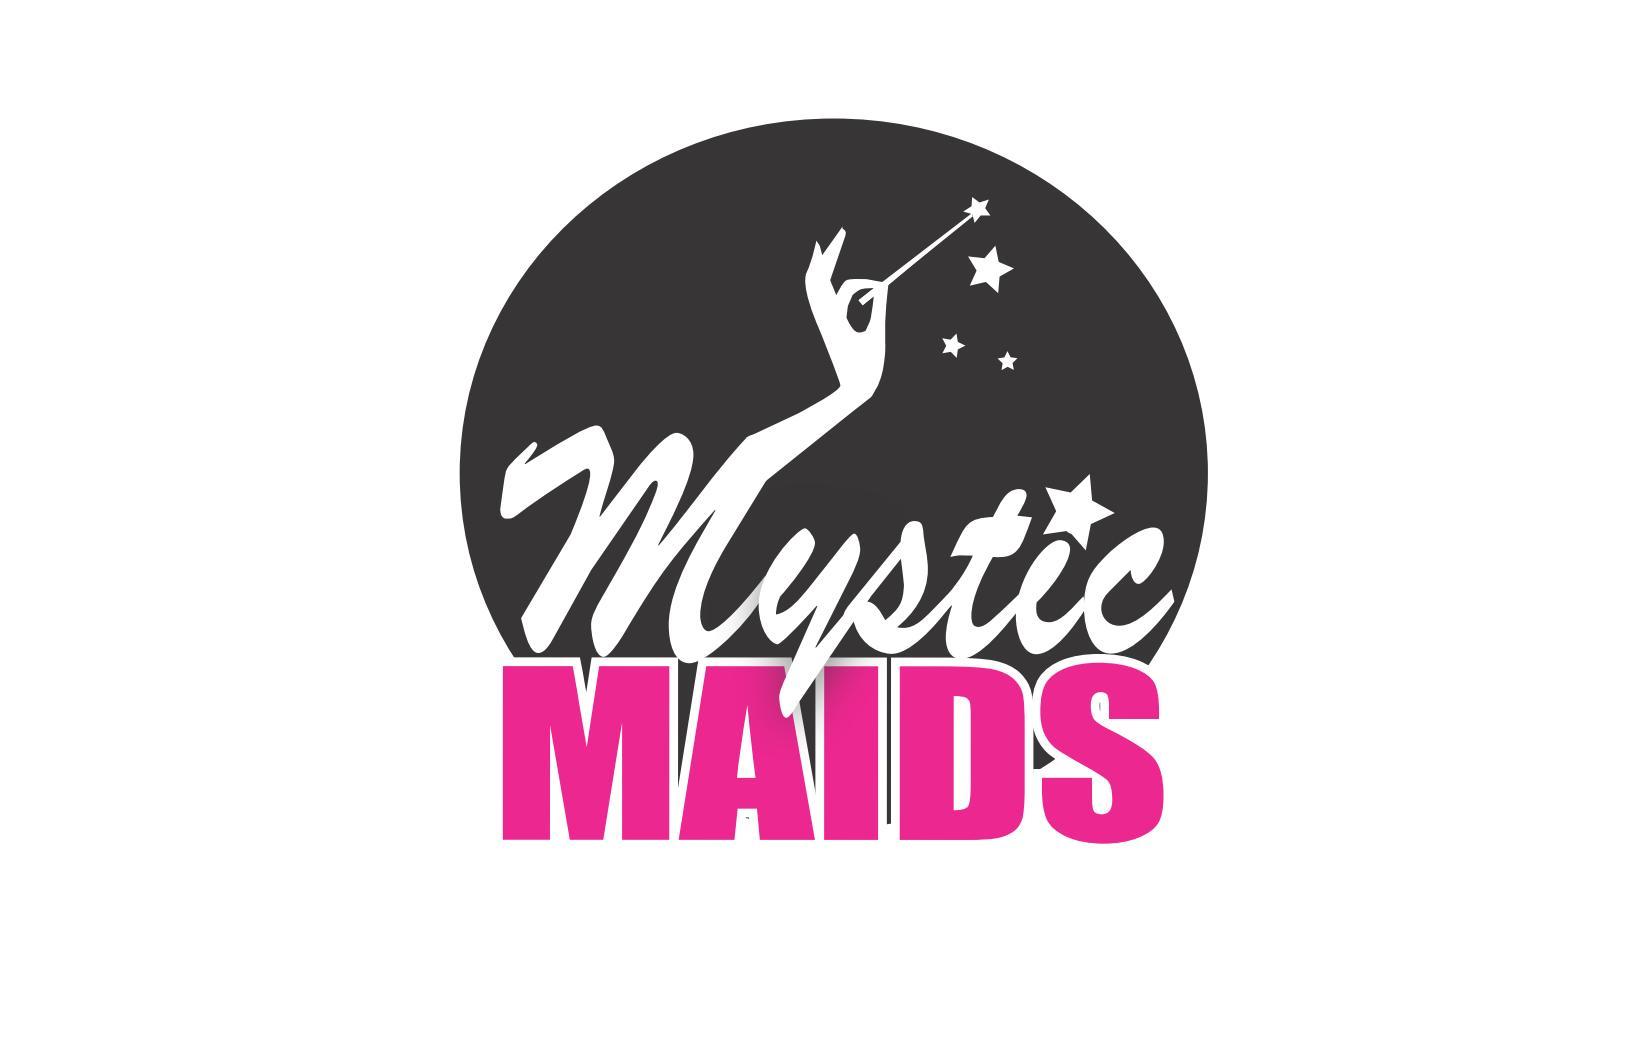 Mystic Maids logo